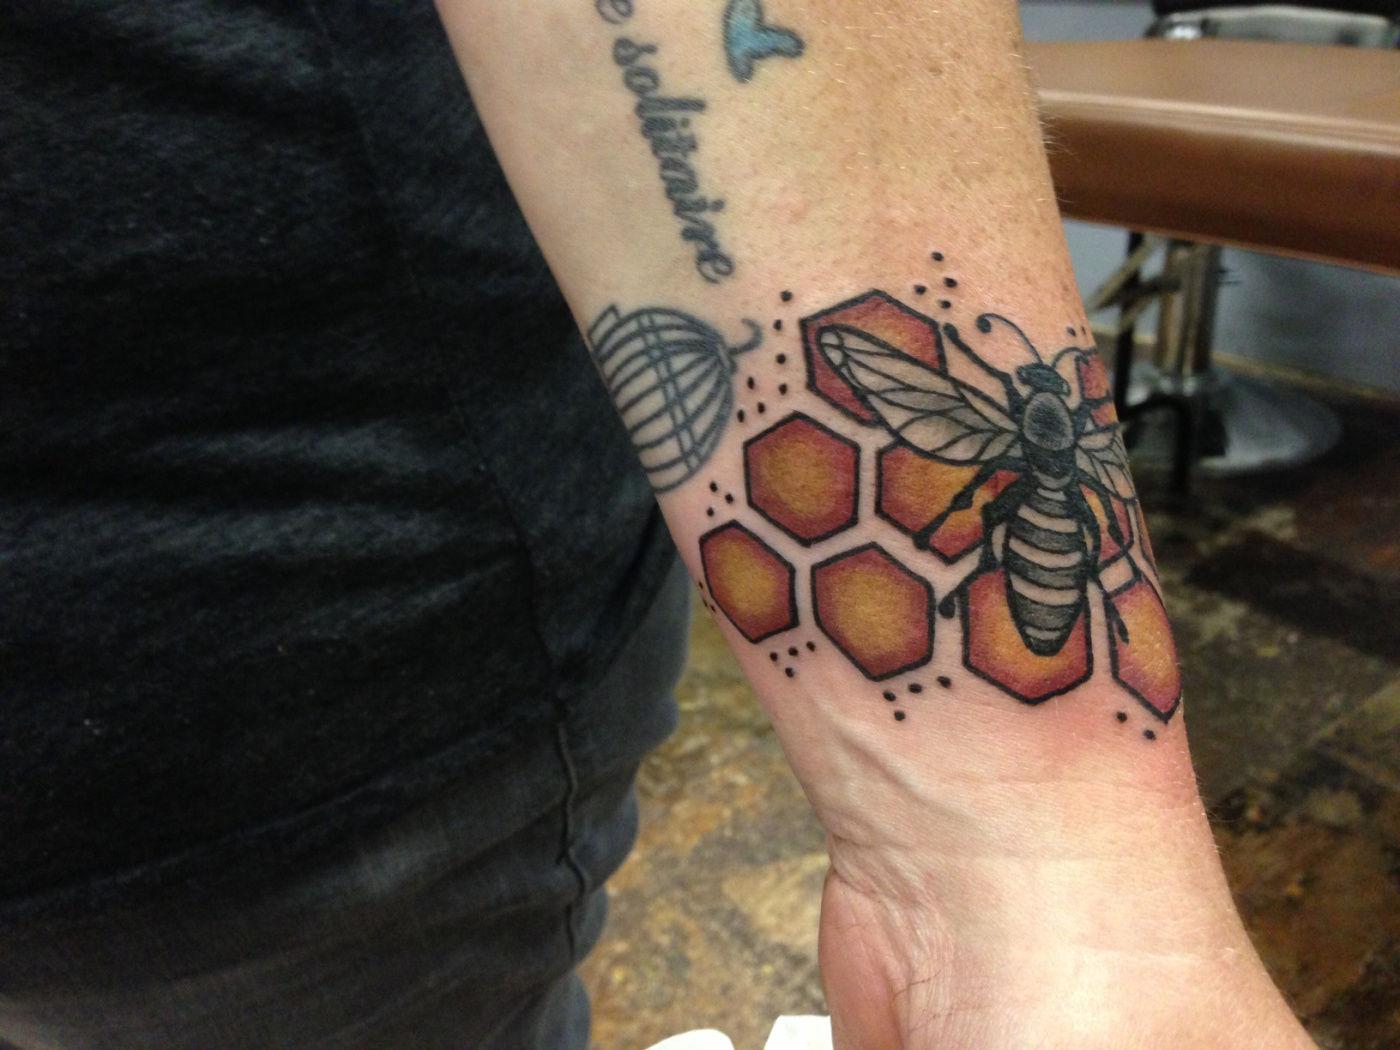 Erinodea-honeycombbee